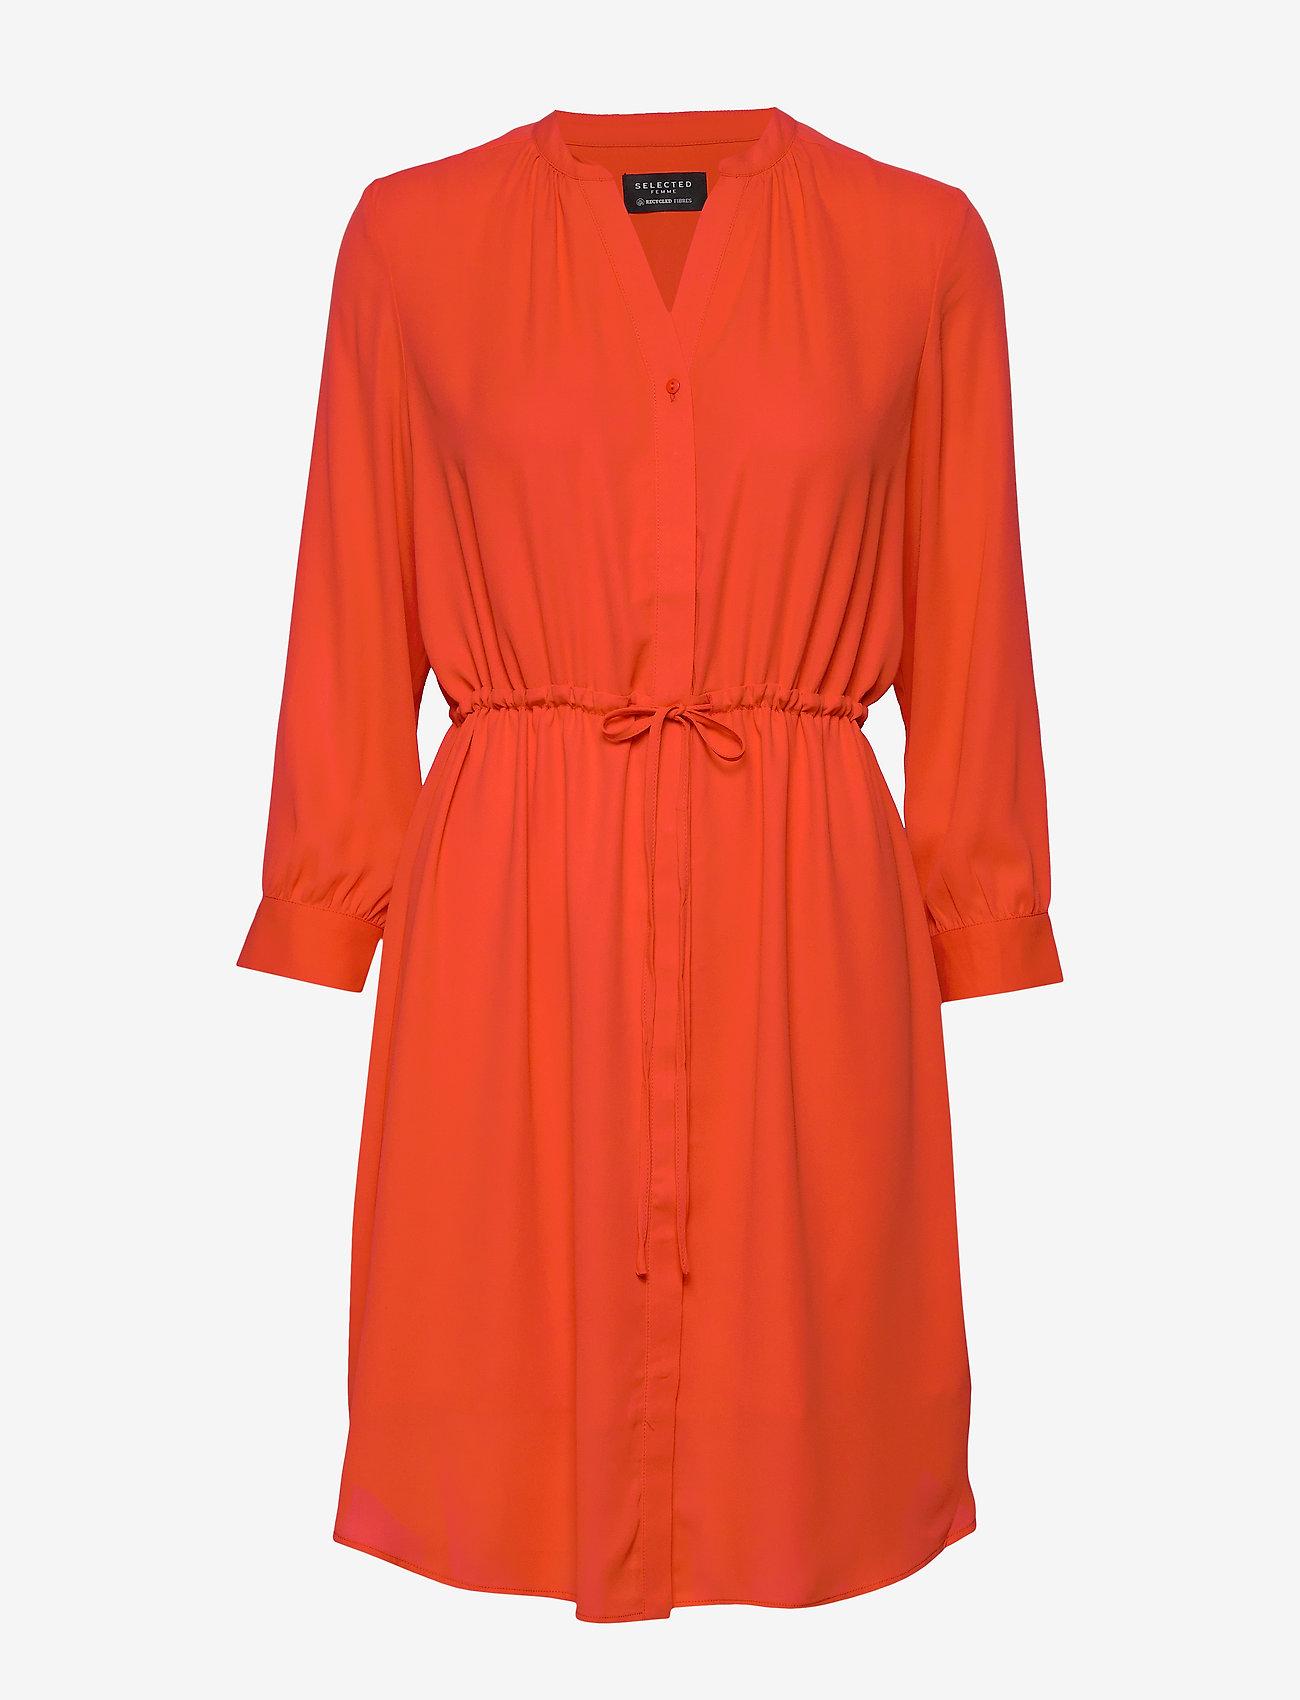 Selected Femme - SLFDAMINA 7/8 DRESS B - robes midi - orange.com - 0